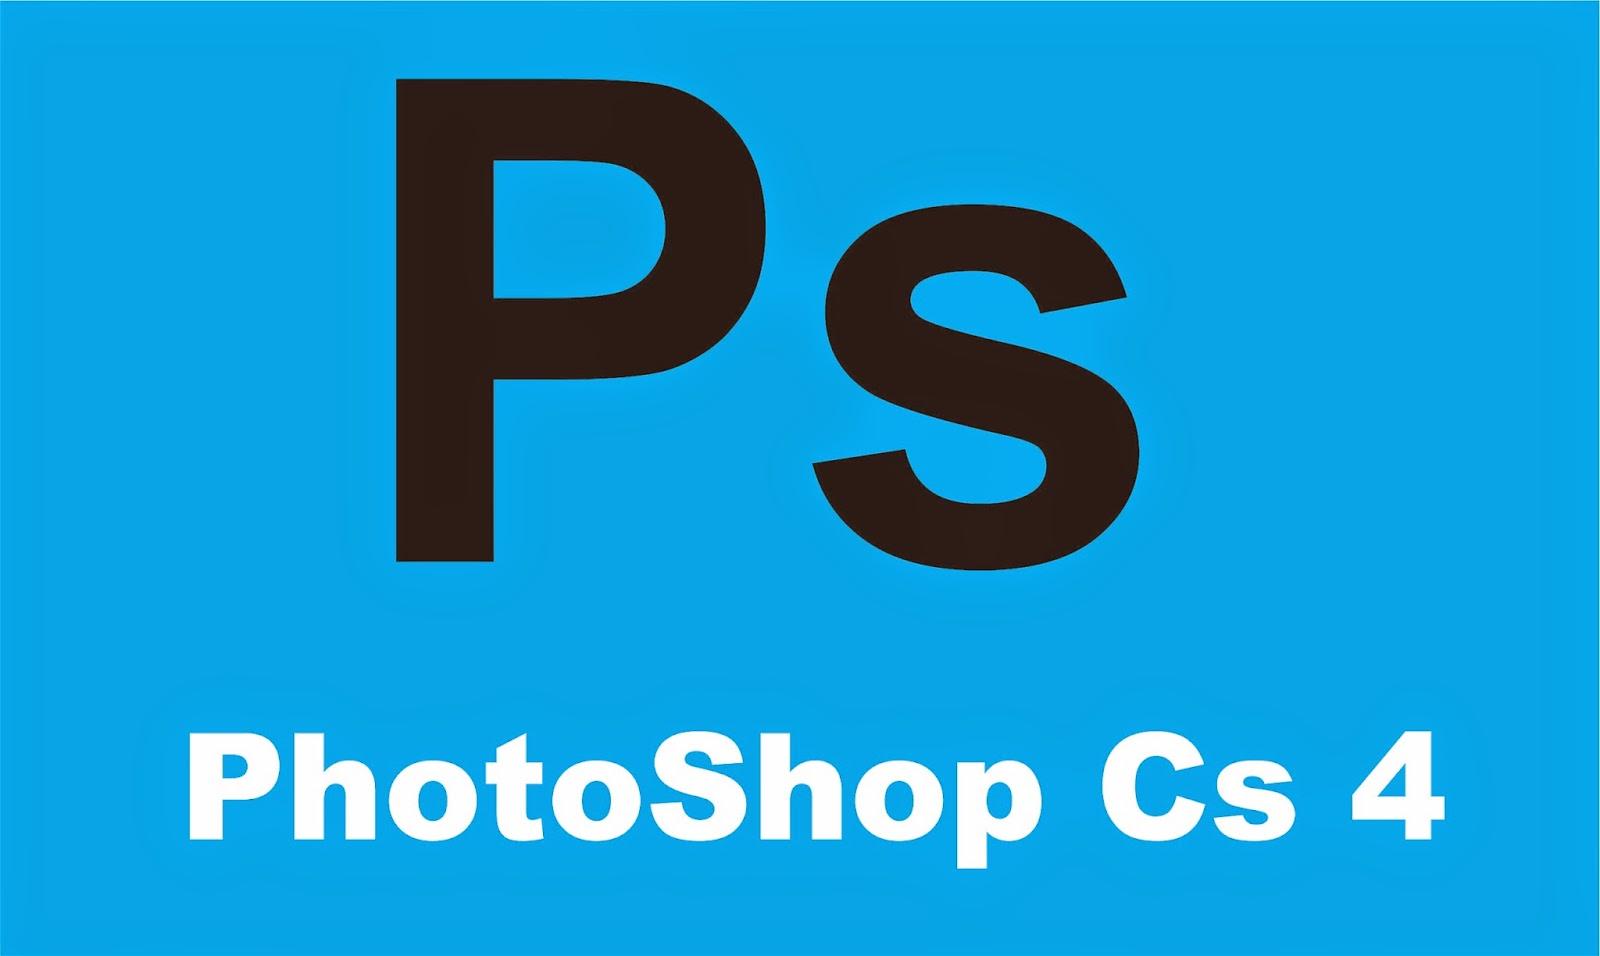 Portable adobe photoshop cs4 free download windows 7